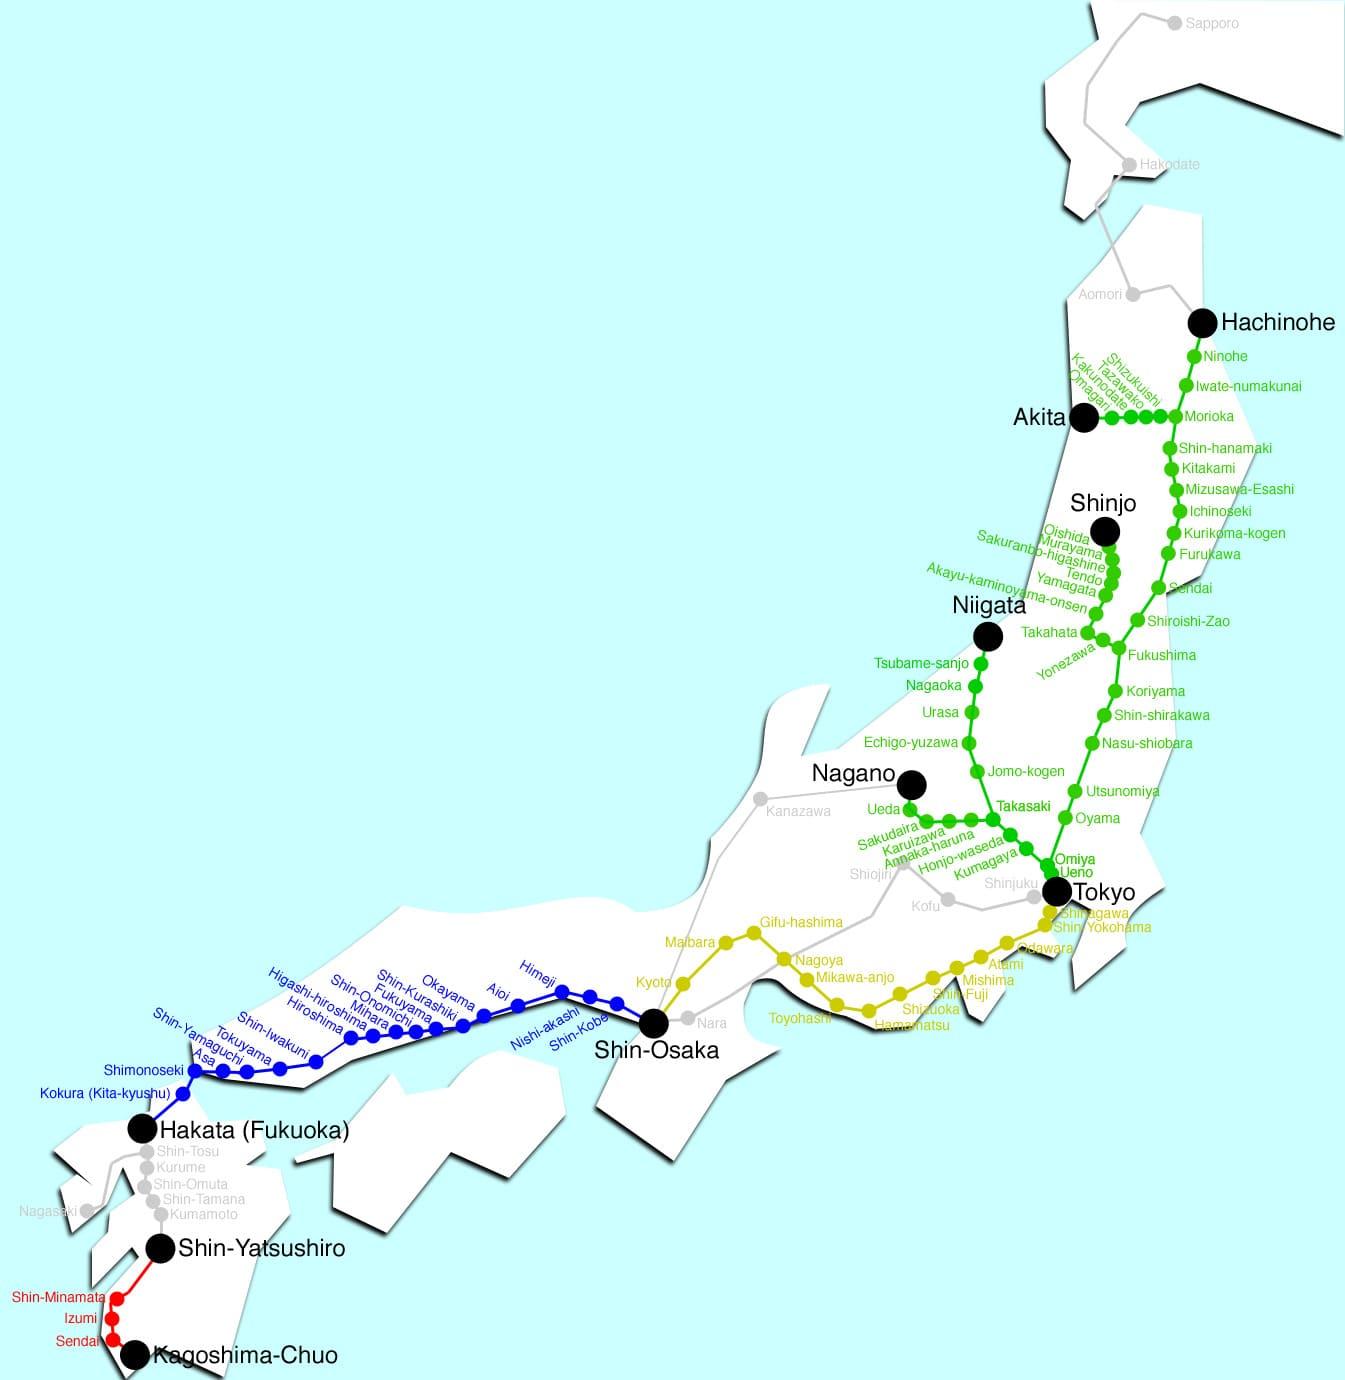 Mapa del Shinkansen